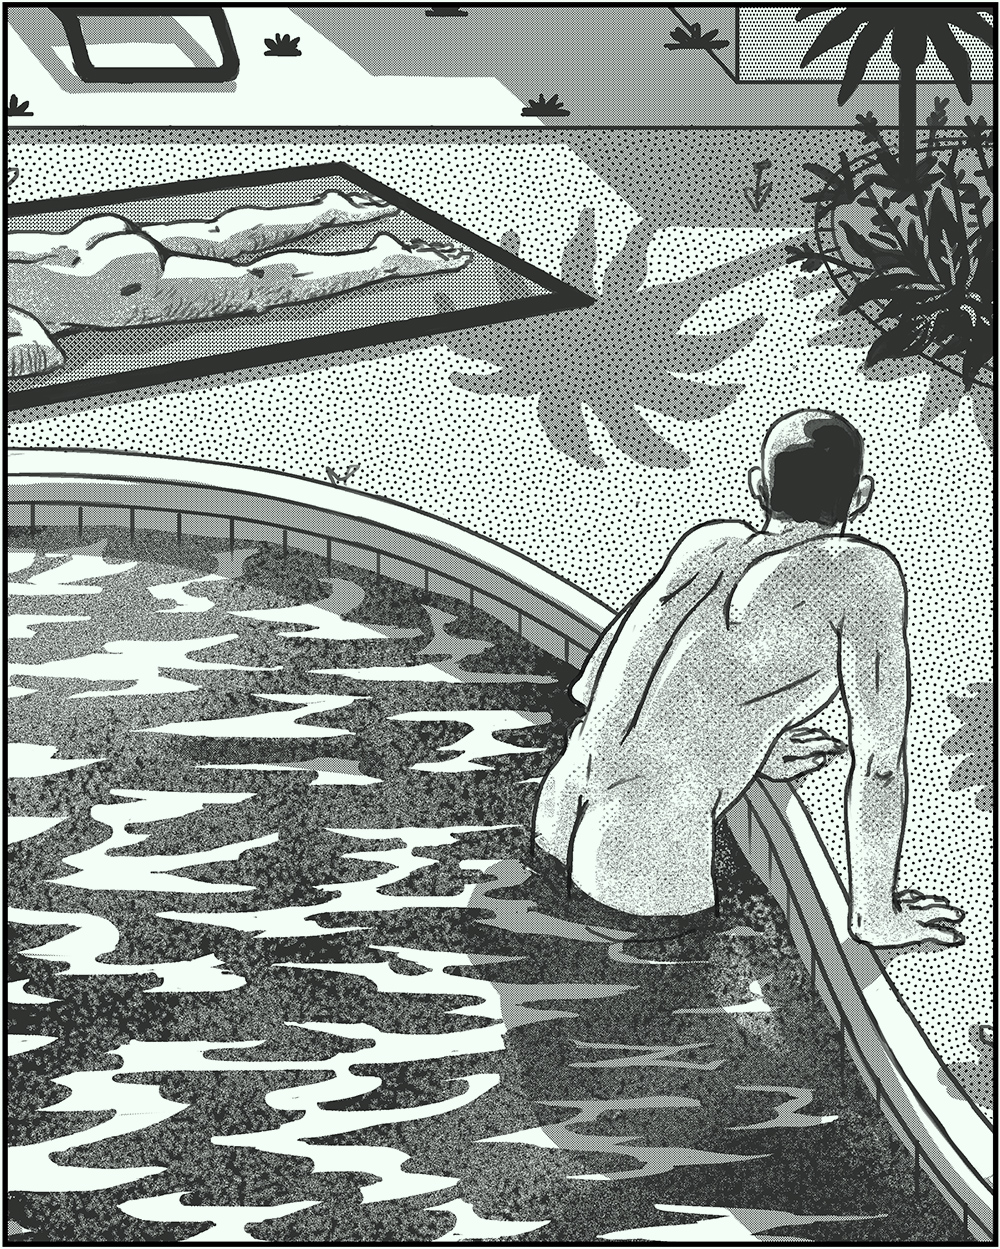 Pool_BW2_small.jpg